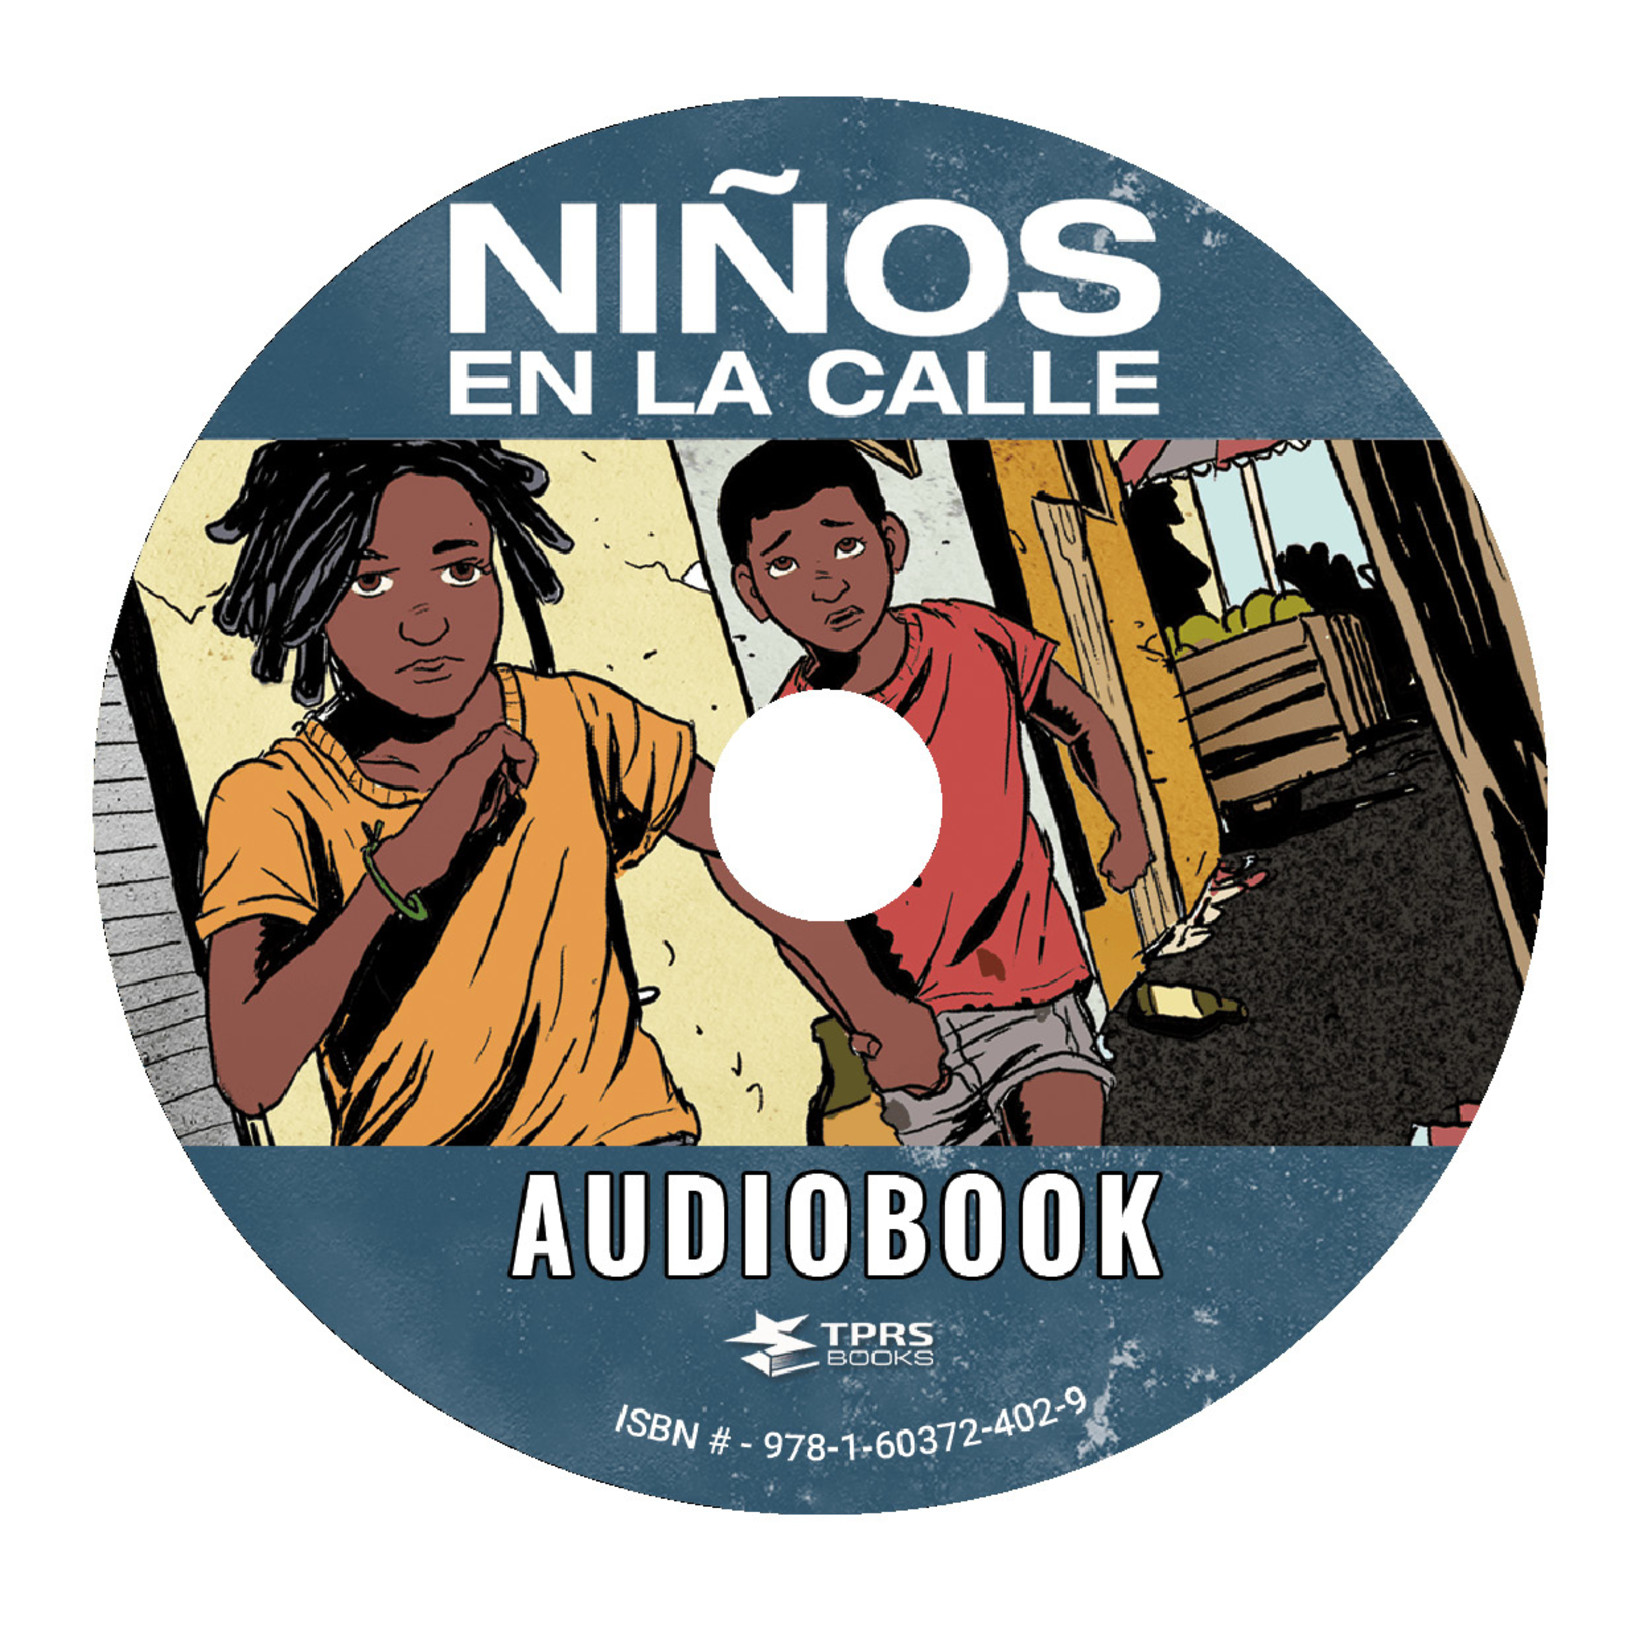 Chris Mercer Books Niños en la calle - Audiobook